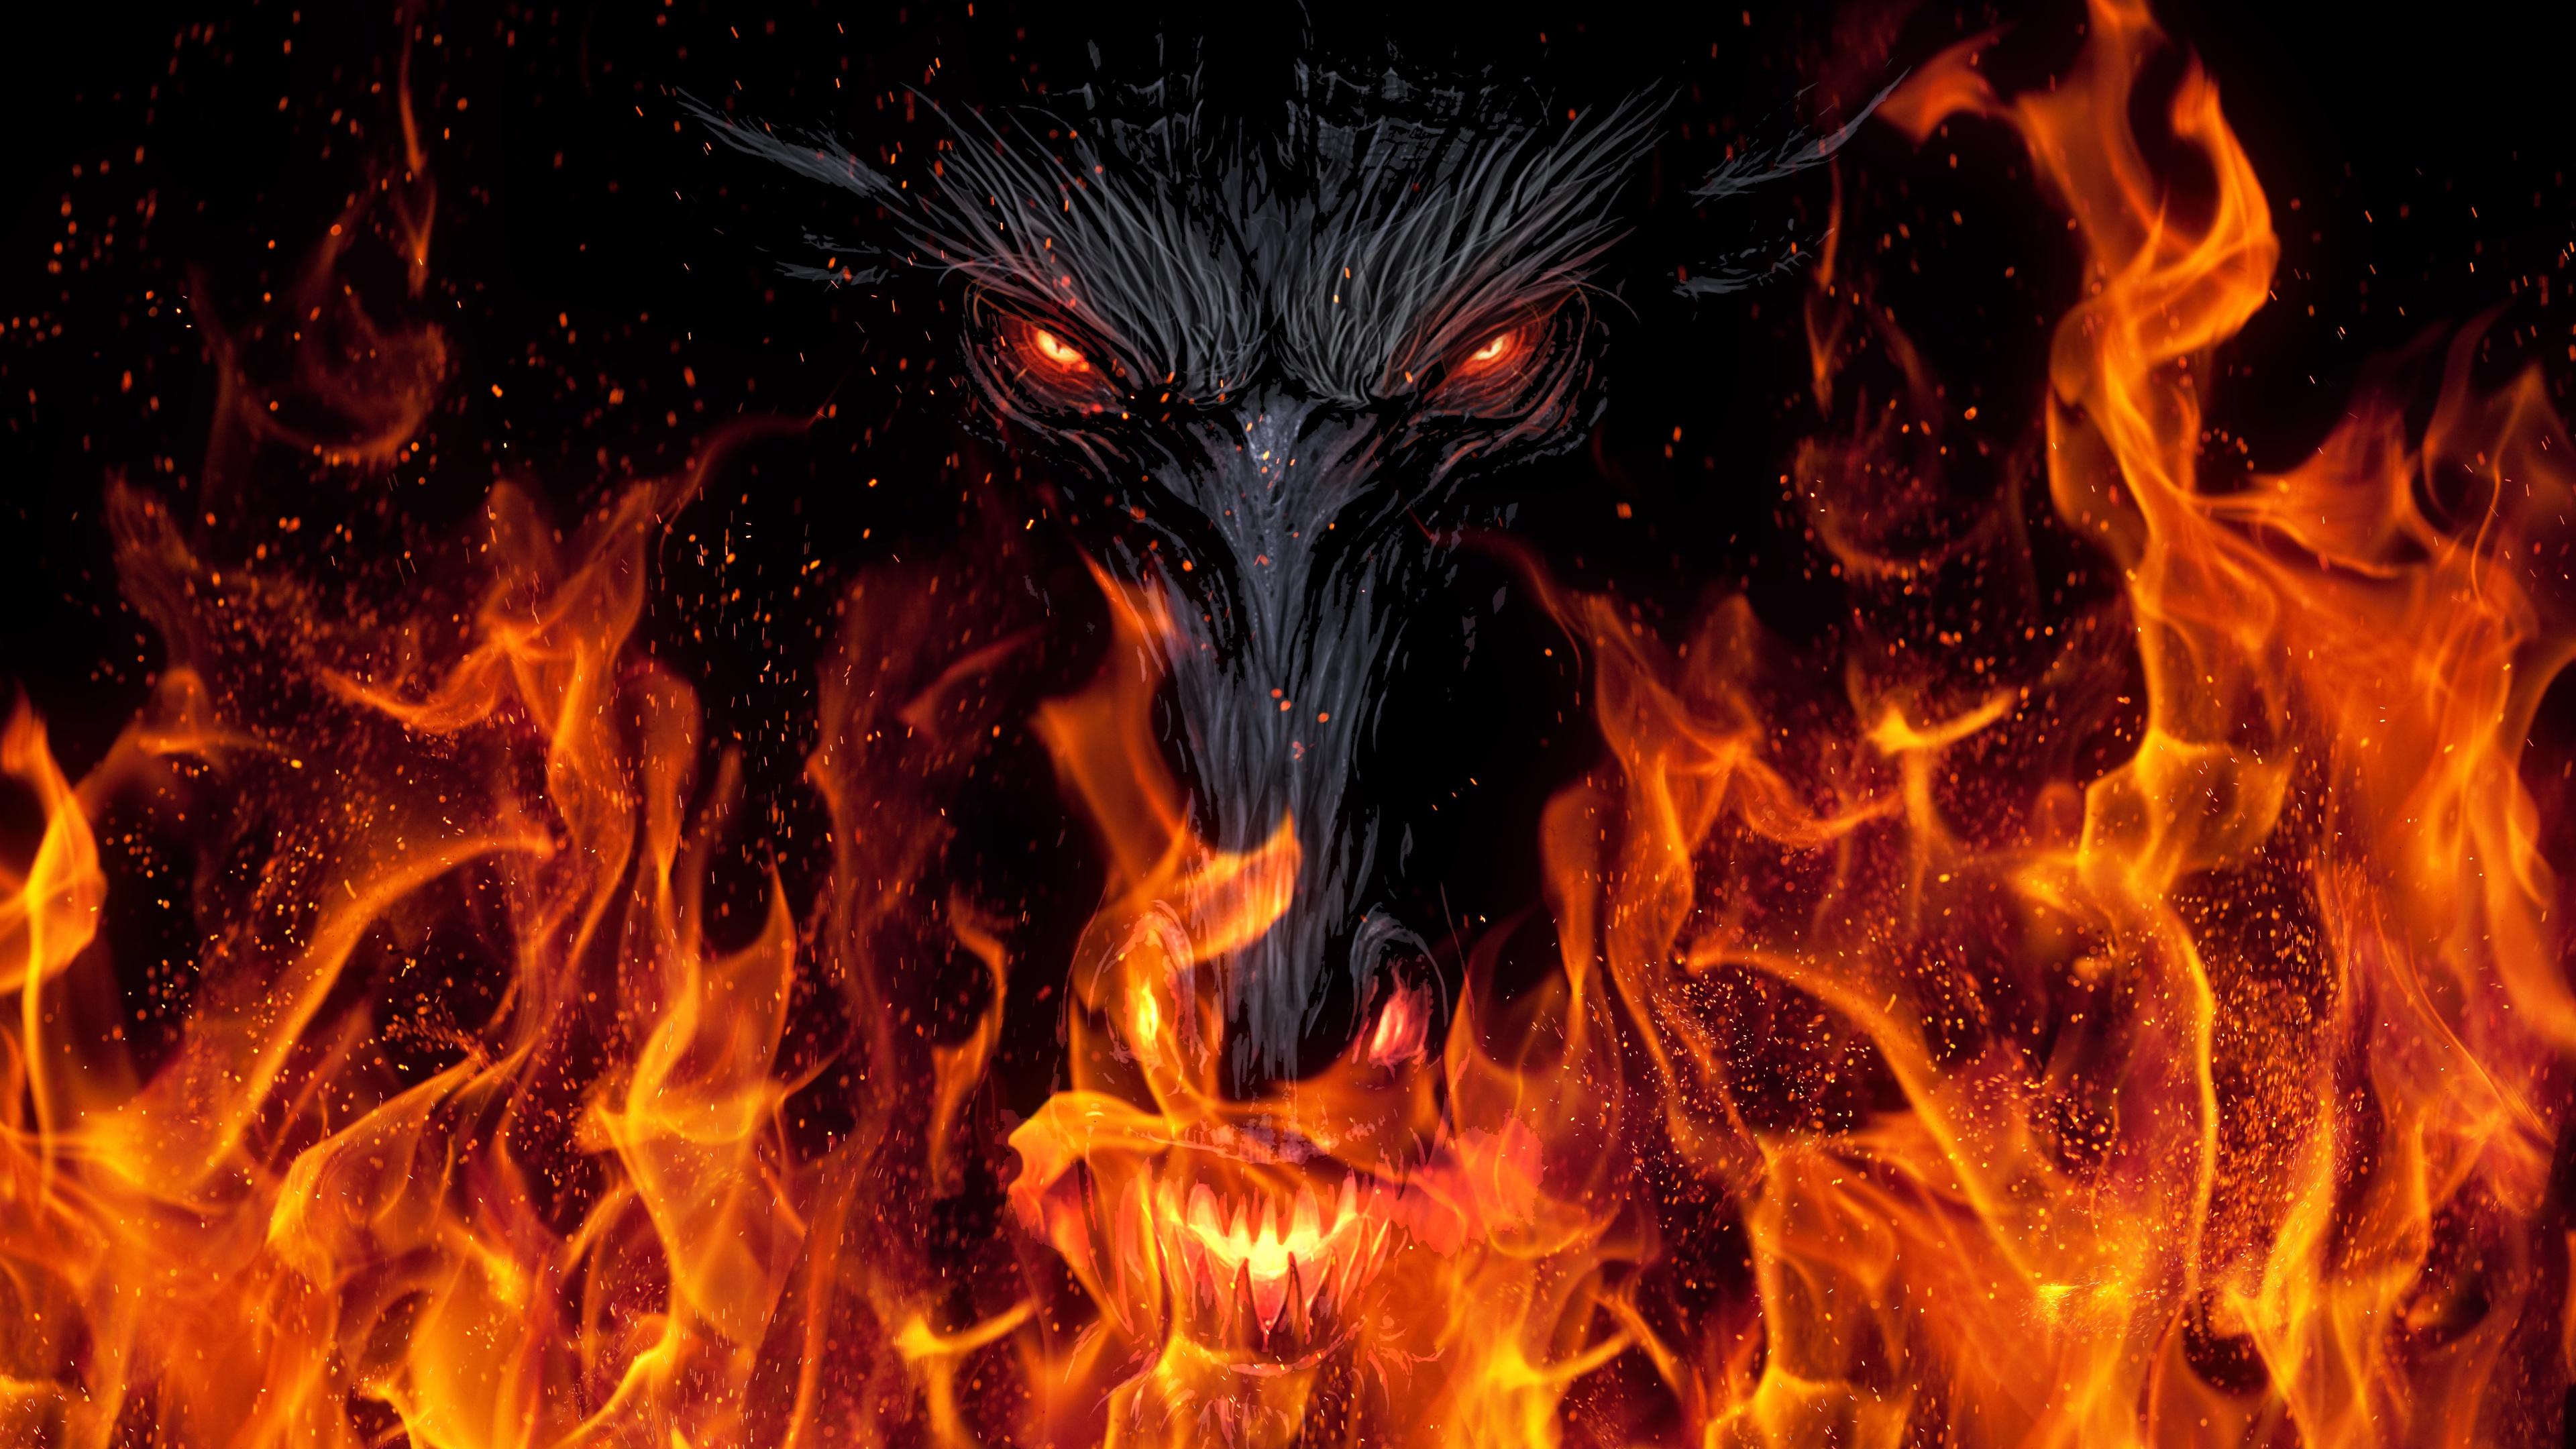 dragon demon devil 4k 1540750939 - Dragon Demon Devil 4k - hd-wallpapers, flame wallpapers, fire wallpapers, dragon wallpapers, digital art wallpapers, devil wallpapers, deviantart wallpapers, demon wallpapers, dark wallpapers, artist wallpapers, 4k-wallpapers